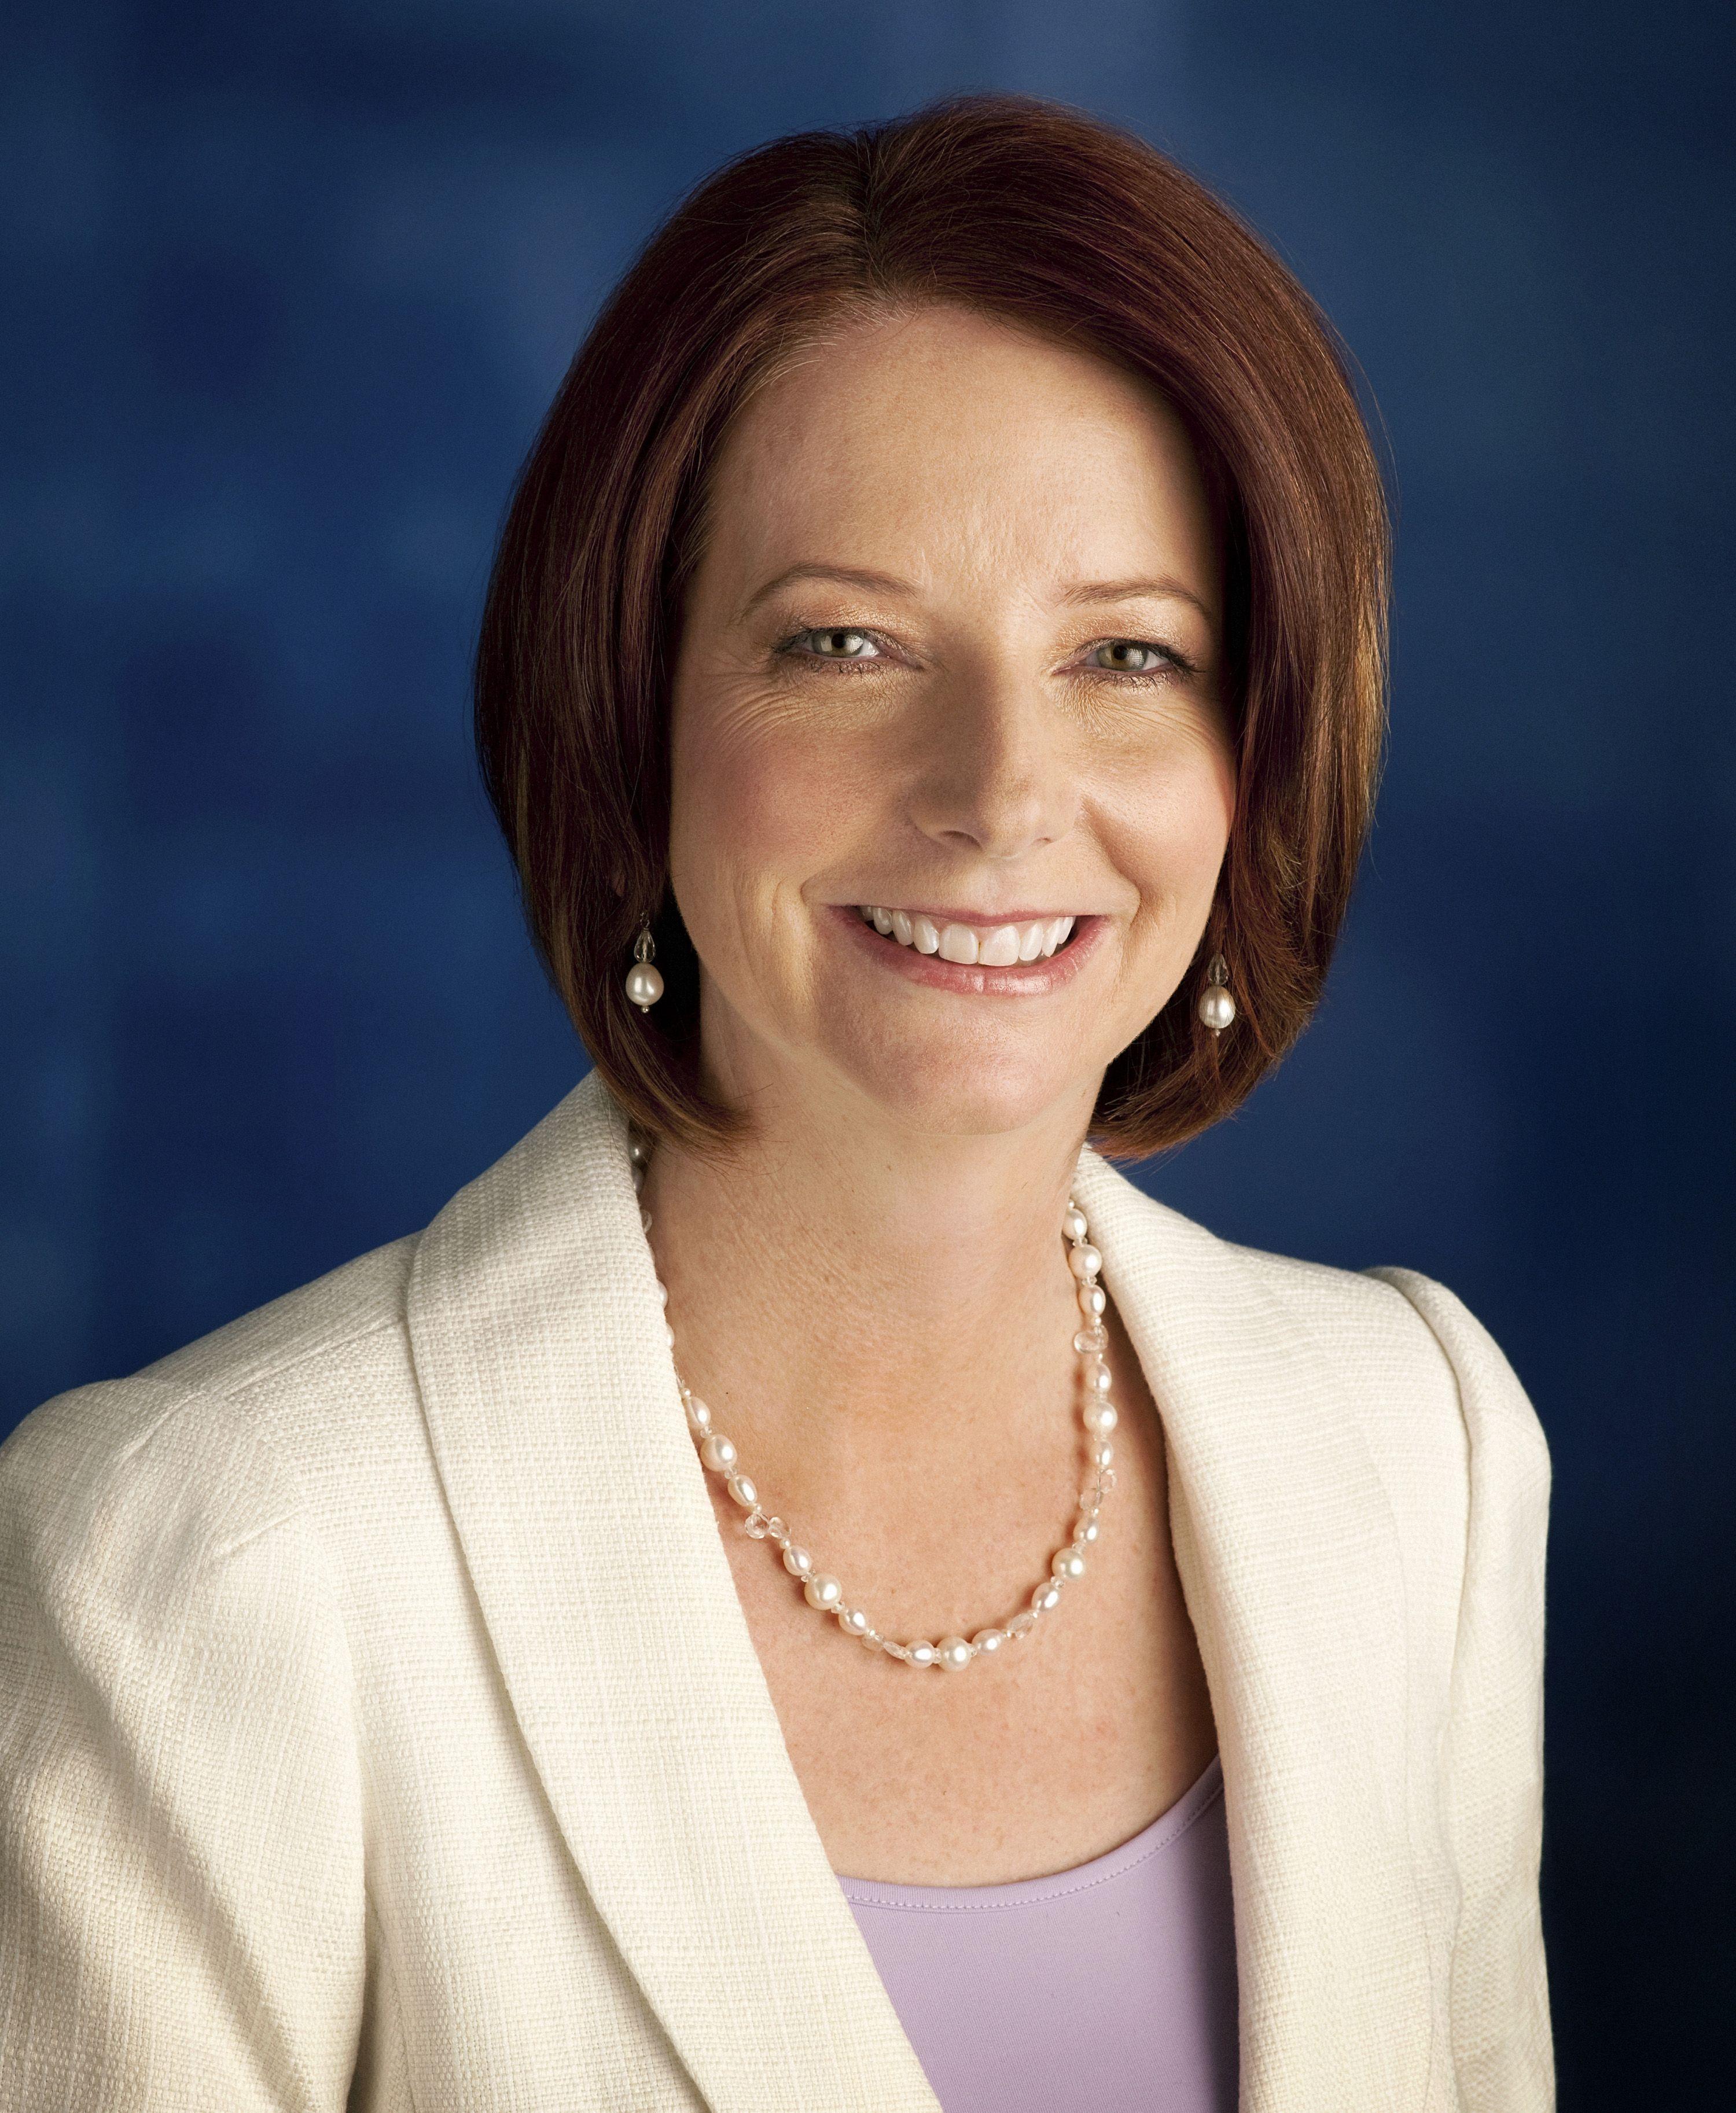 Julia Gillard, Prime Minister